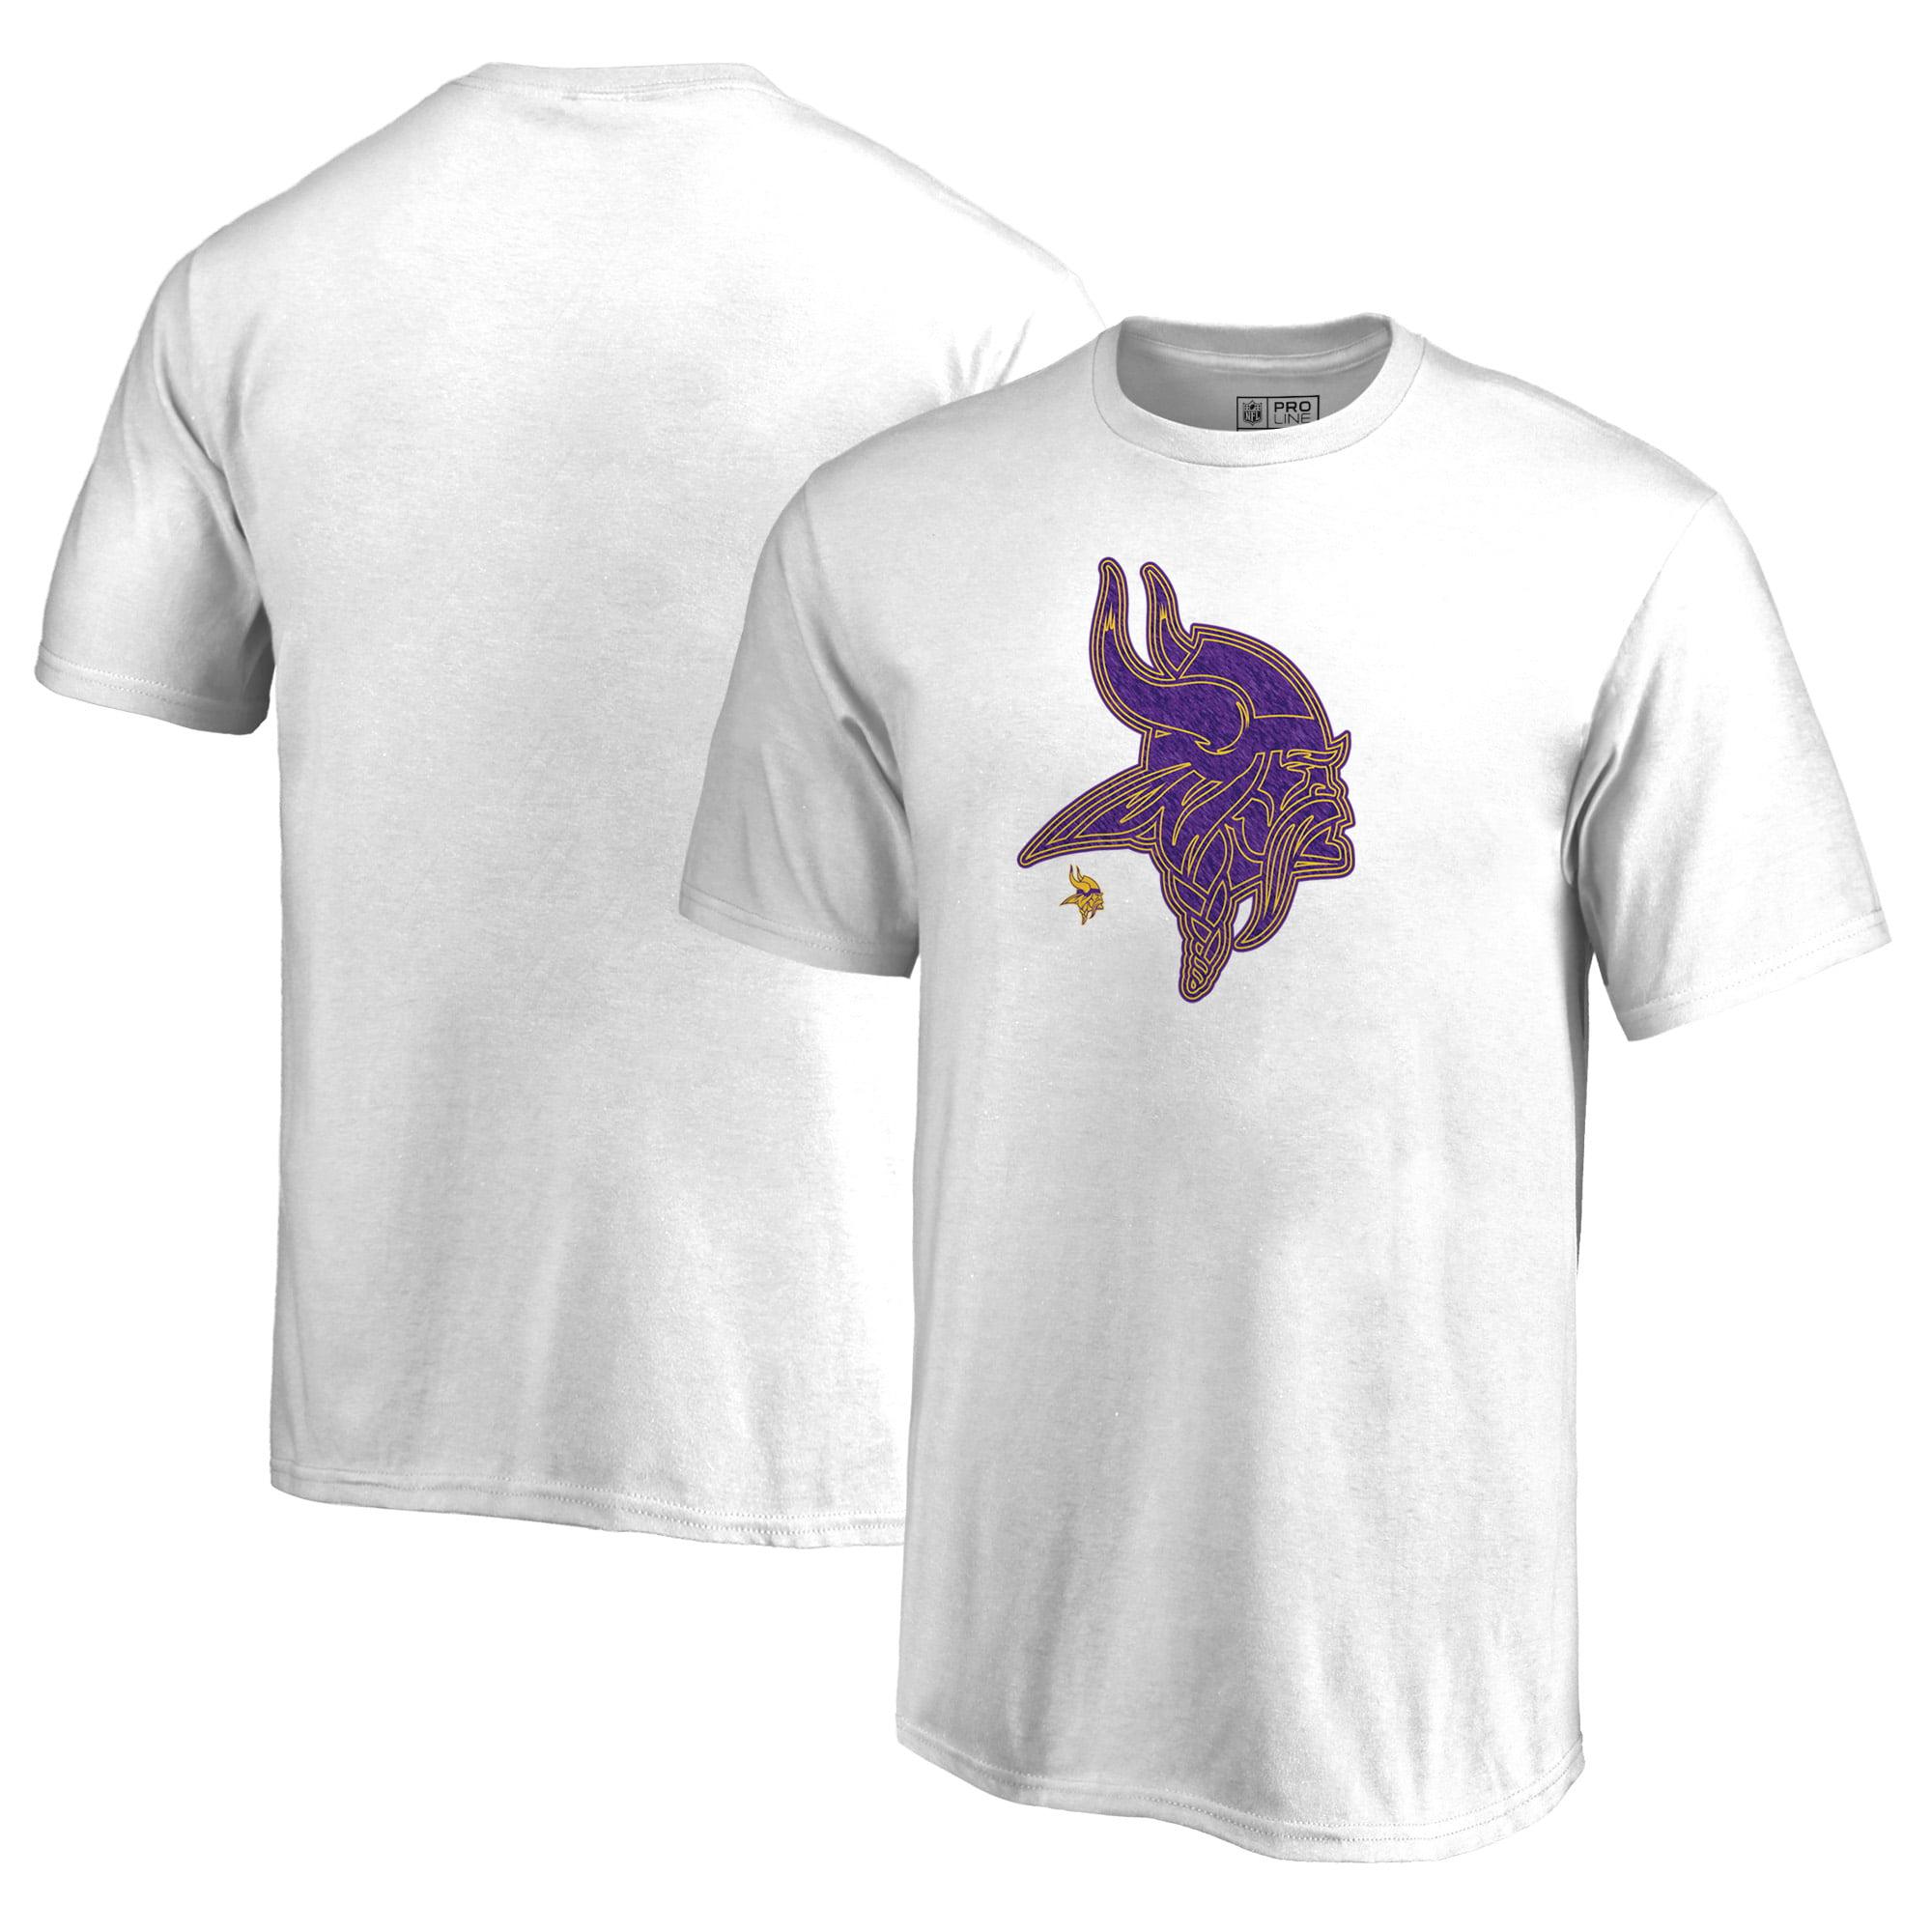 Minnesota Vikings NFL Pro Line by Fanatics Branded Youth Training Camp Hookup T-Shirt - White